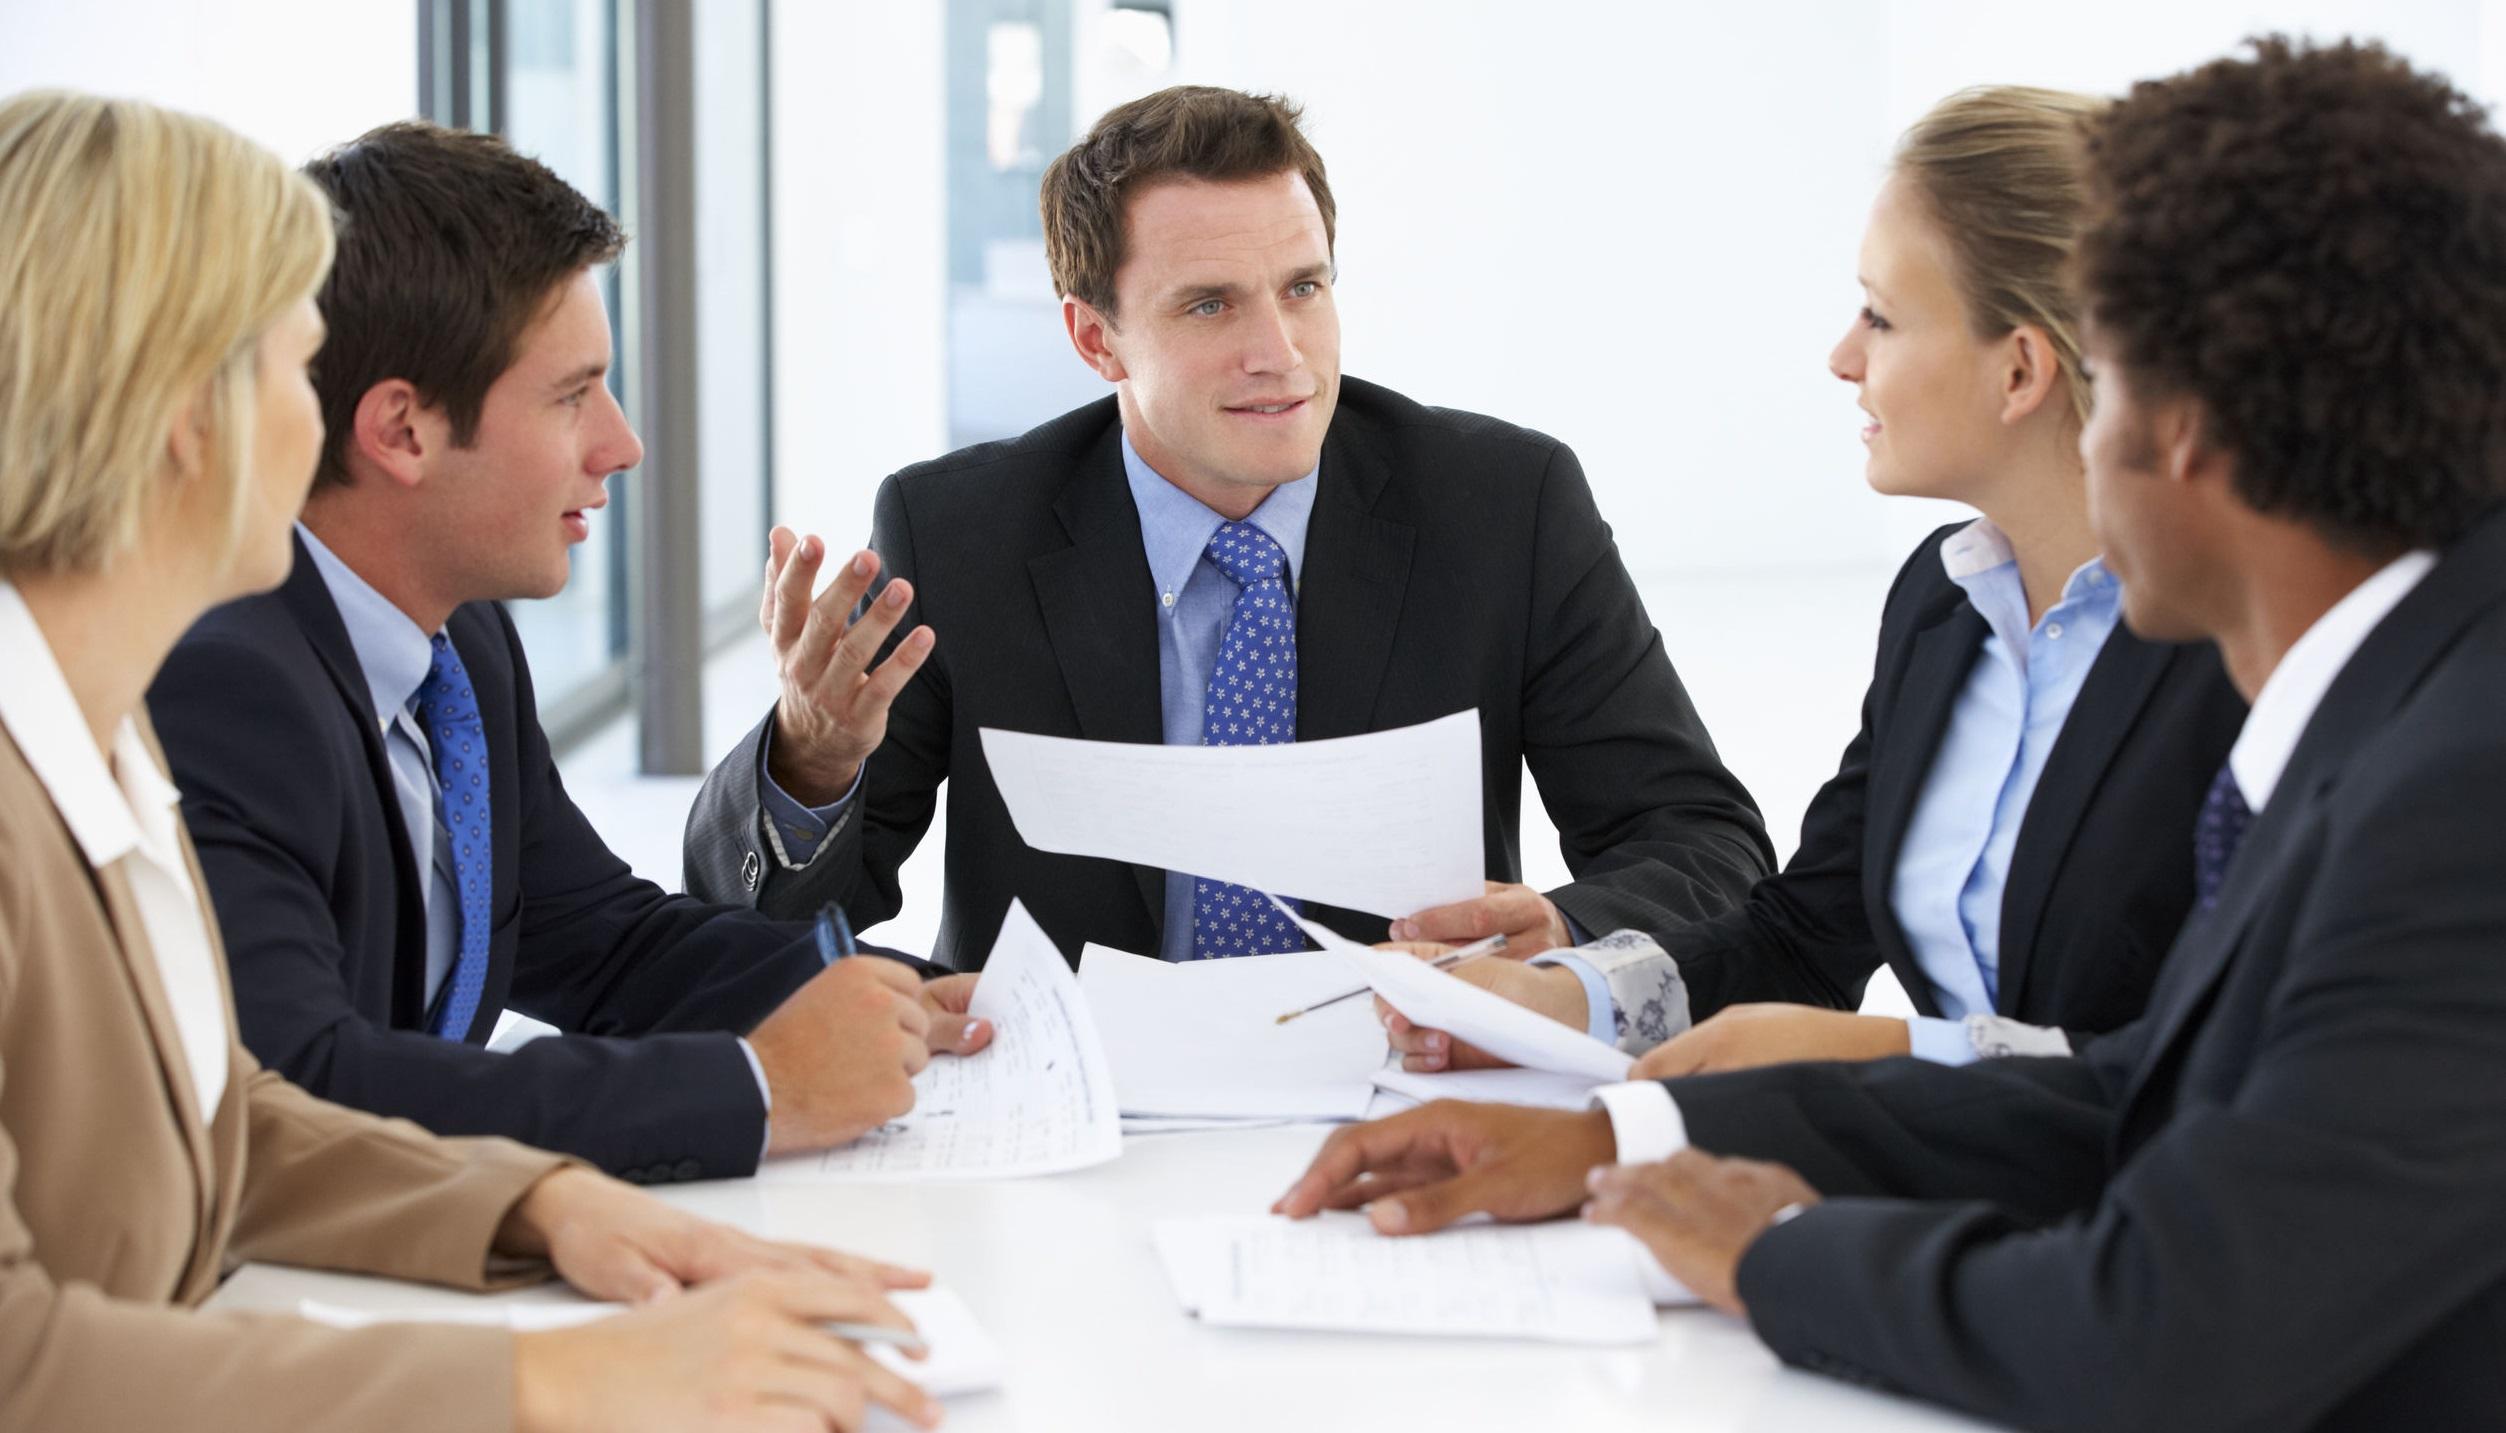 Pitching_business_proposal